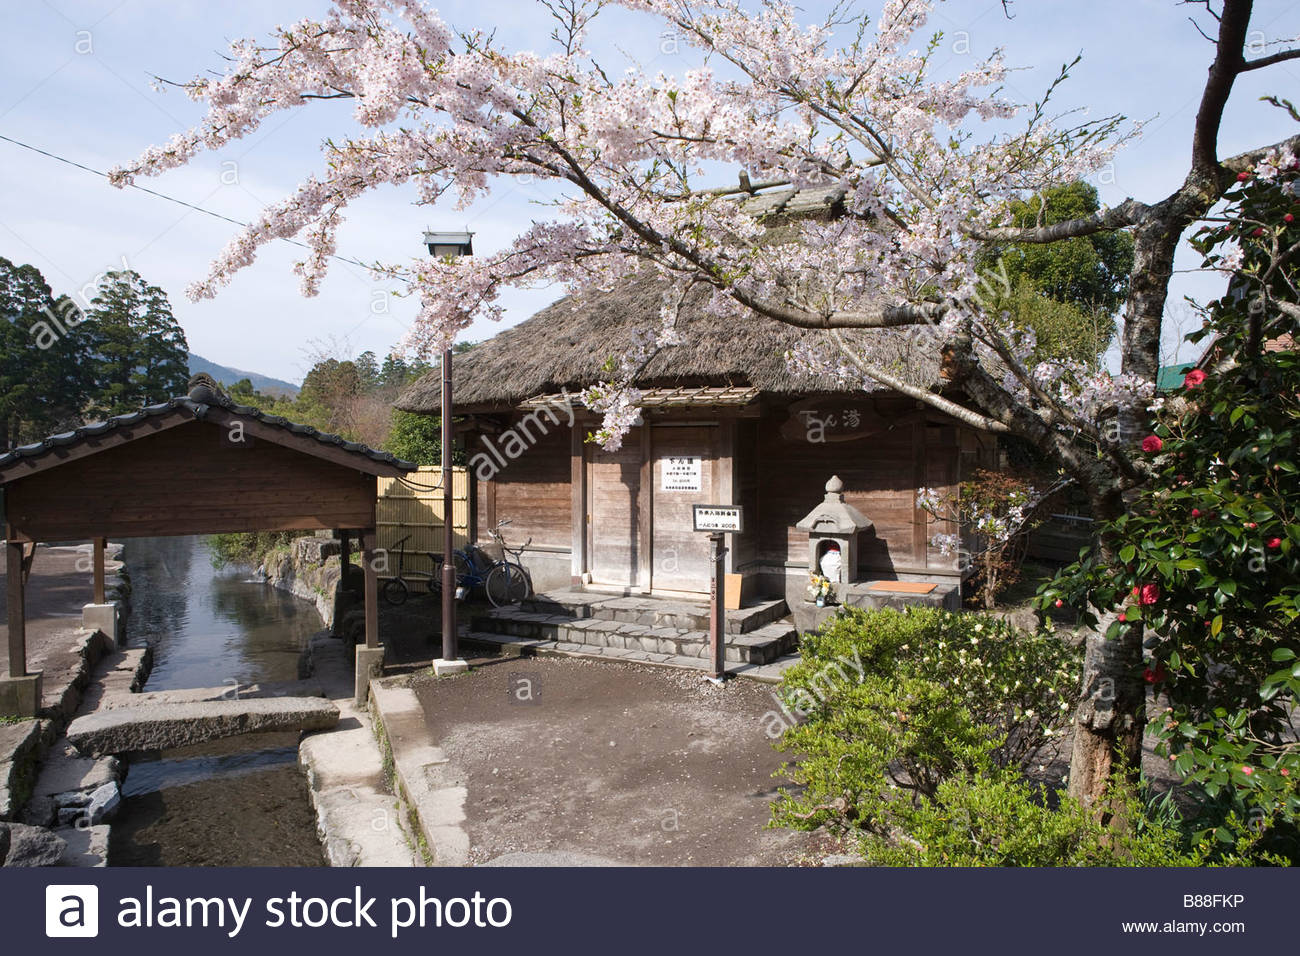 Yuhuin common hot spring shitan yu hot spring cherry blossoms flower yuhuin common hot spring shitan yu hot spring cherry blossoms flower yuhu oita kyushu japan mightylinksfo Images